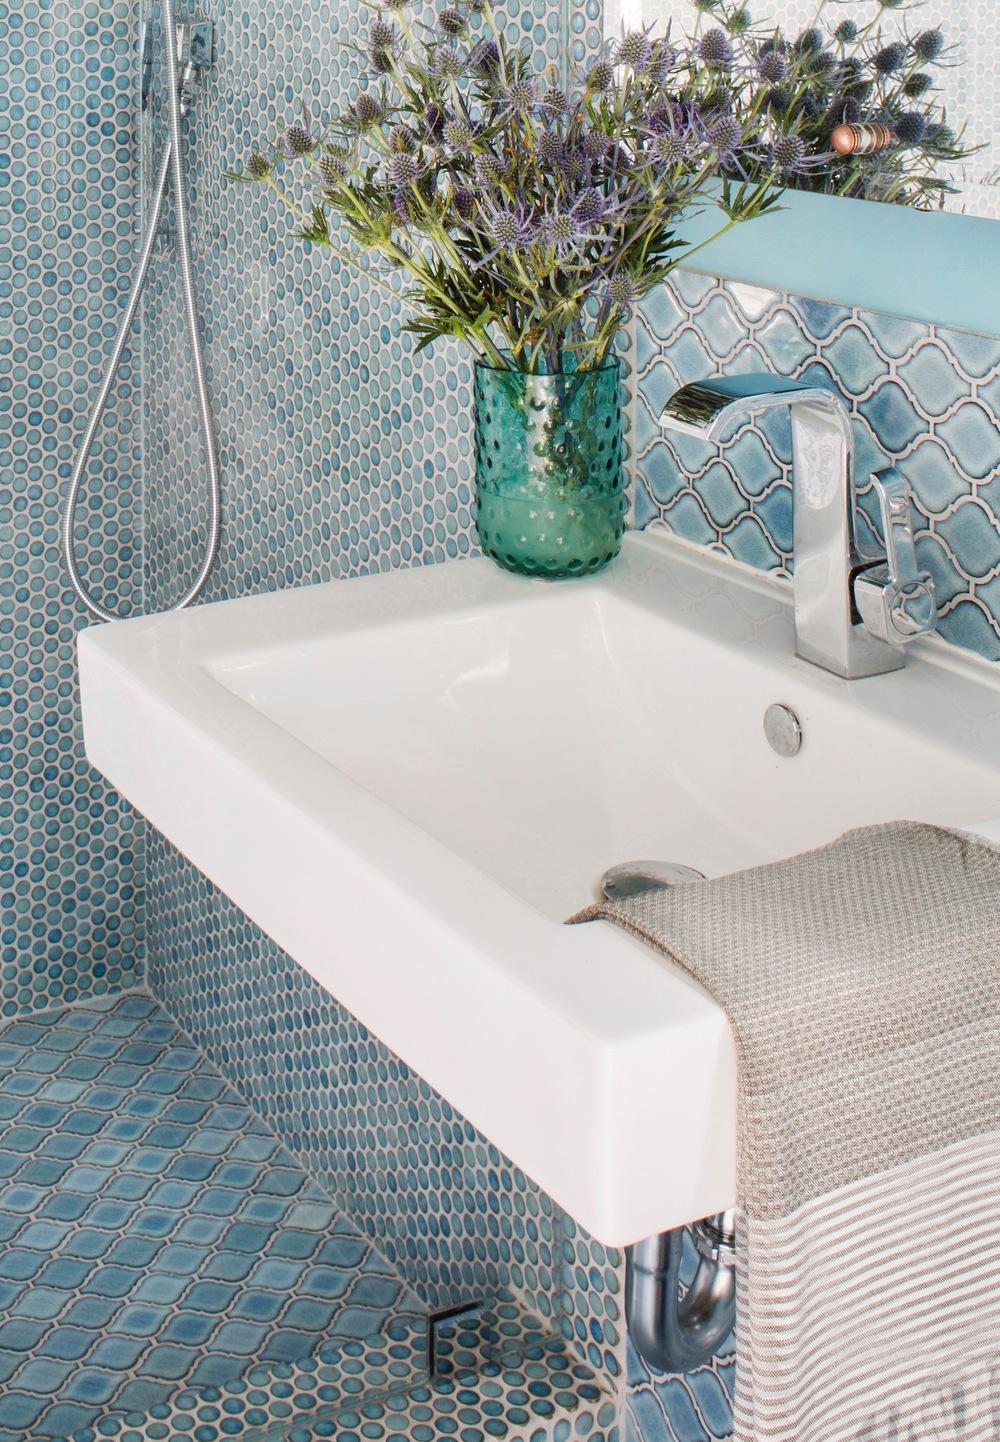 Shelby_WestHollywood_Bathroom_Detail (1).jpg